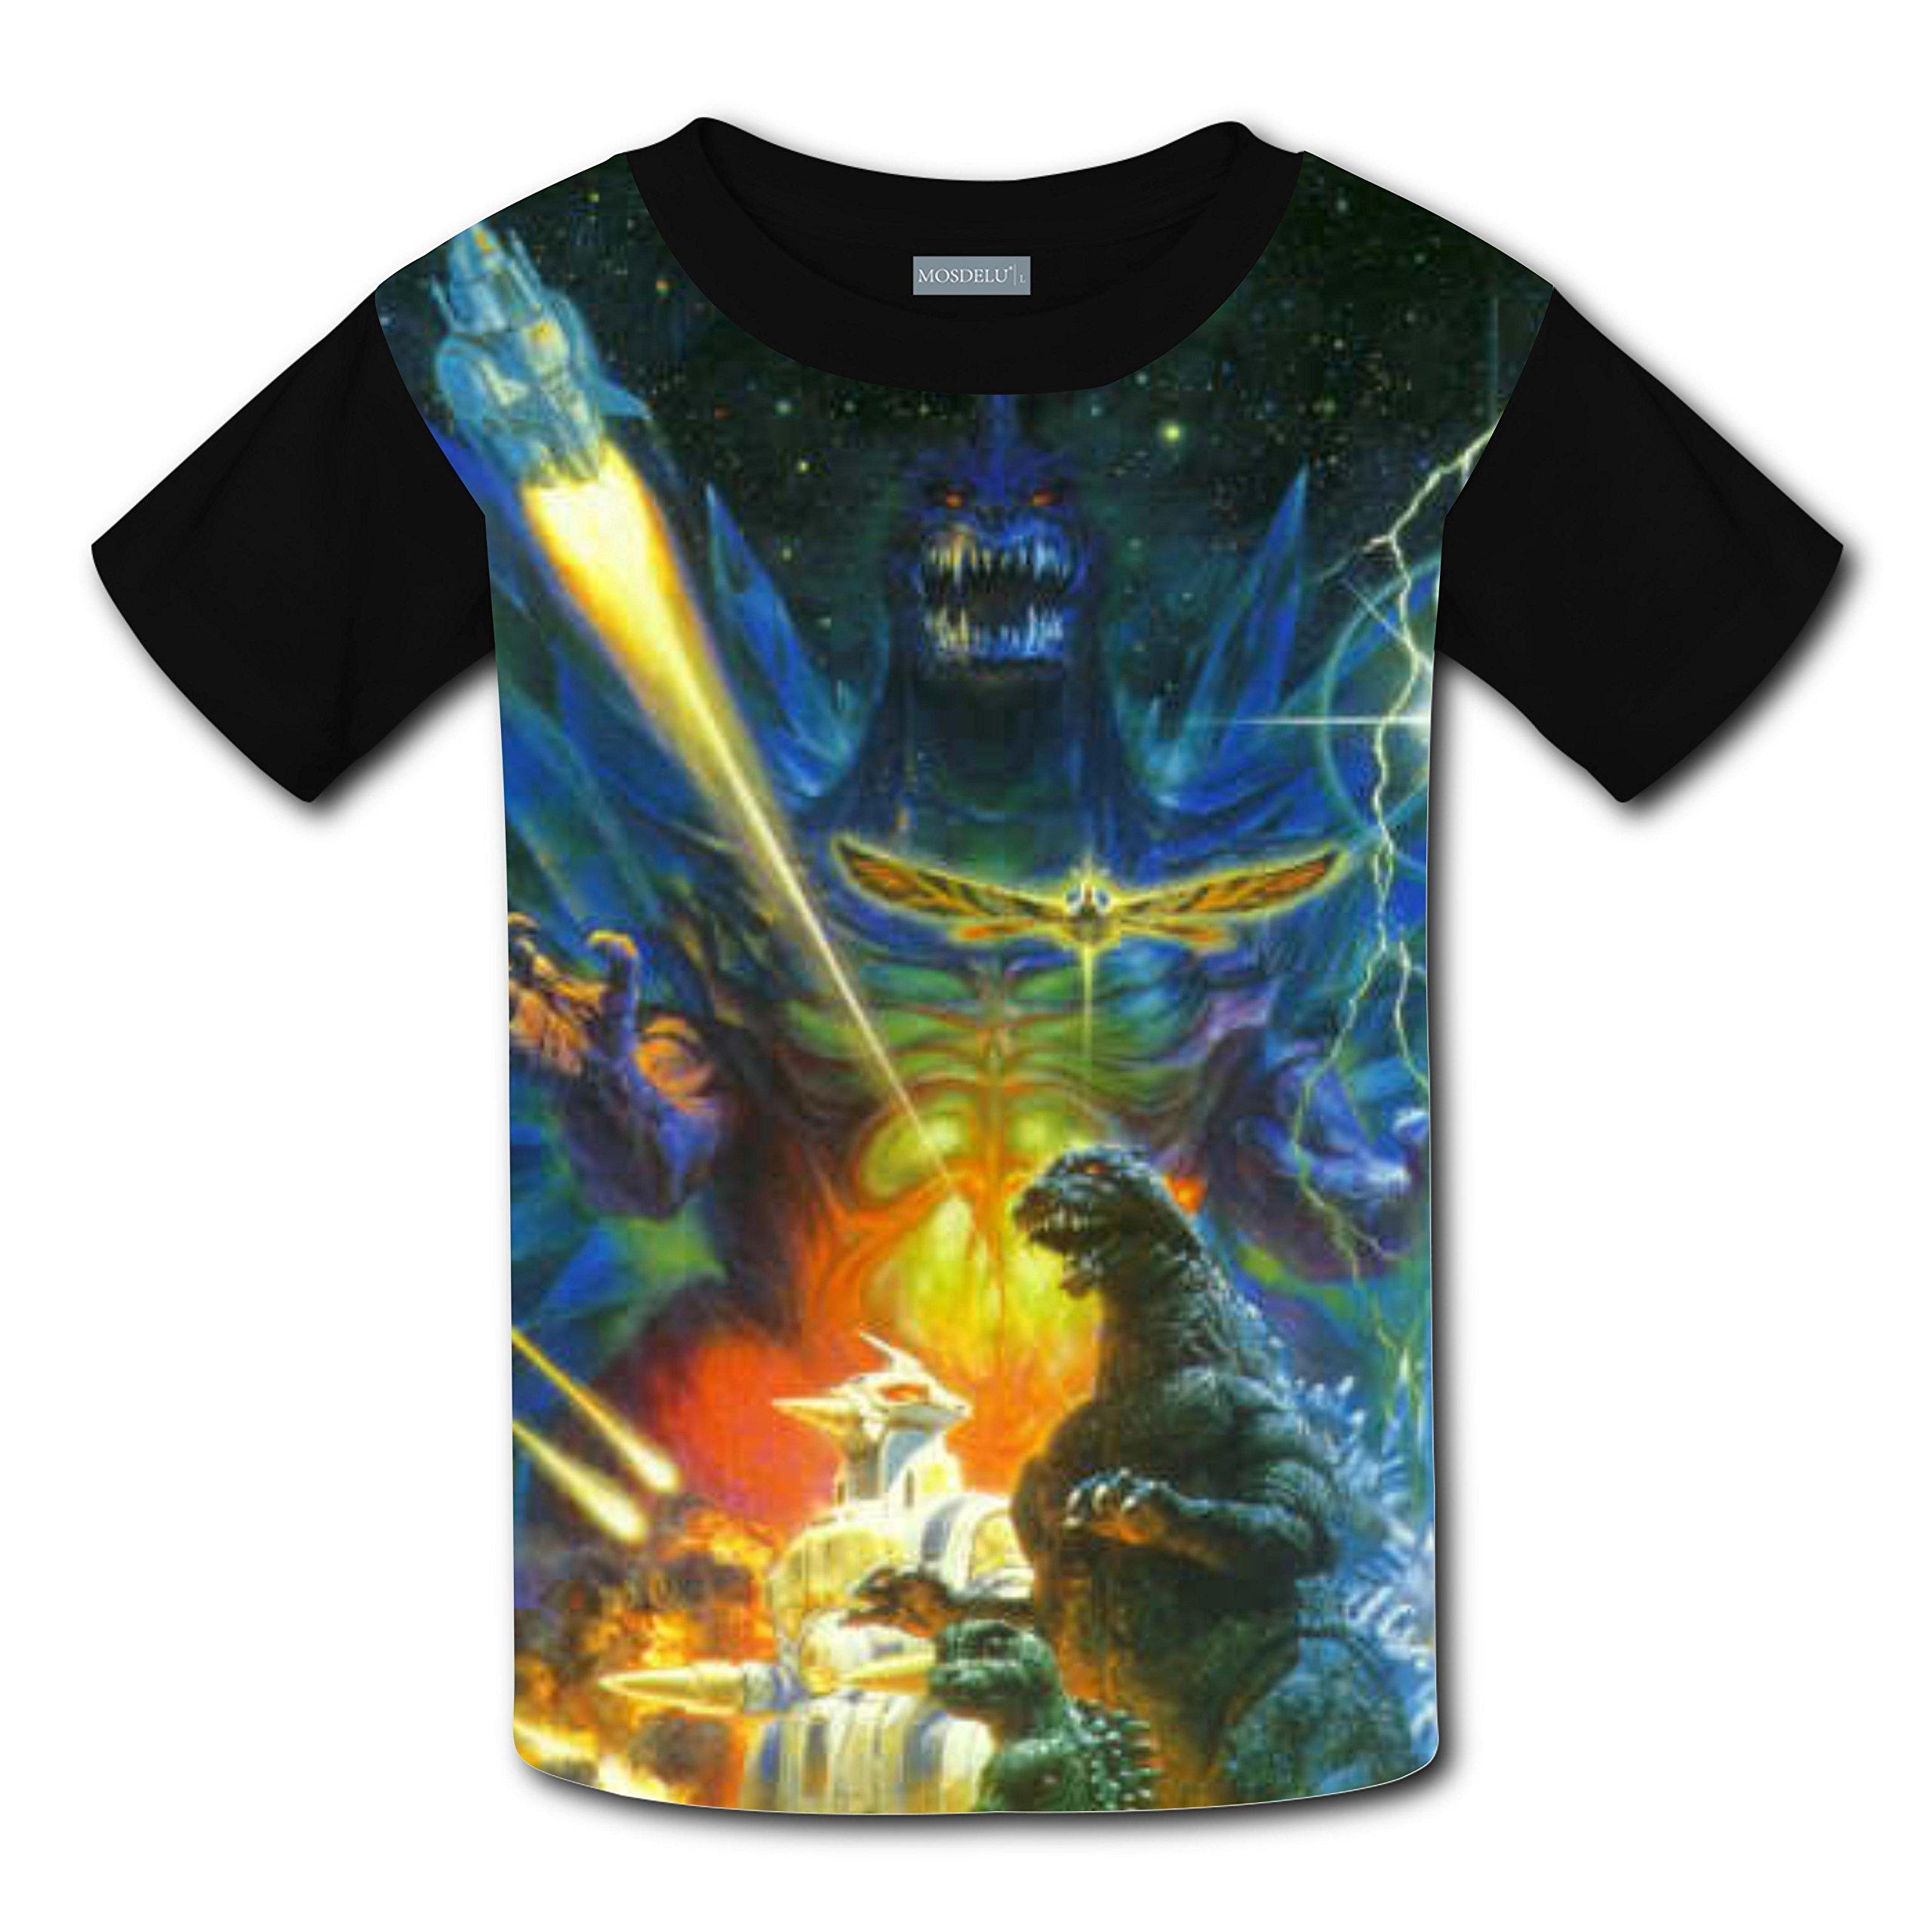 RODONO Unisex Kids Godzilla 3D Printed Round Collar Short Sleeve T- Shirt by RODONO